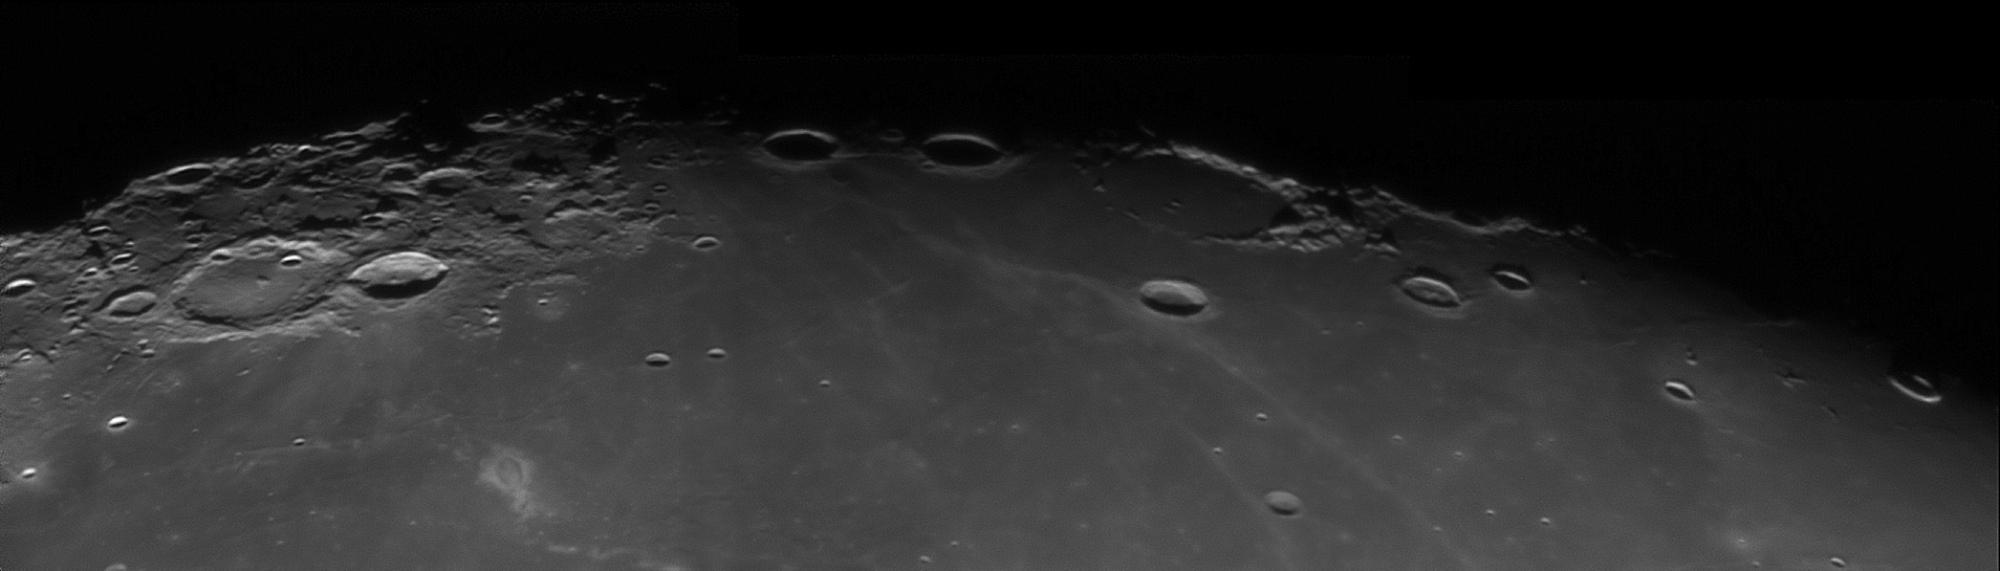 lune2.thumb.jpg.f0a1be5401b7c2b4caee88ee672d01ca.jpg